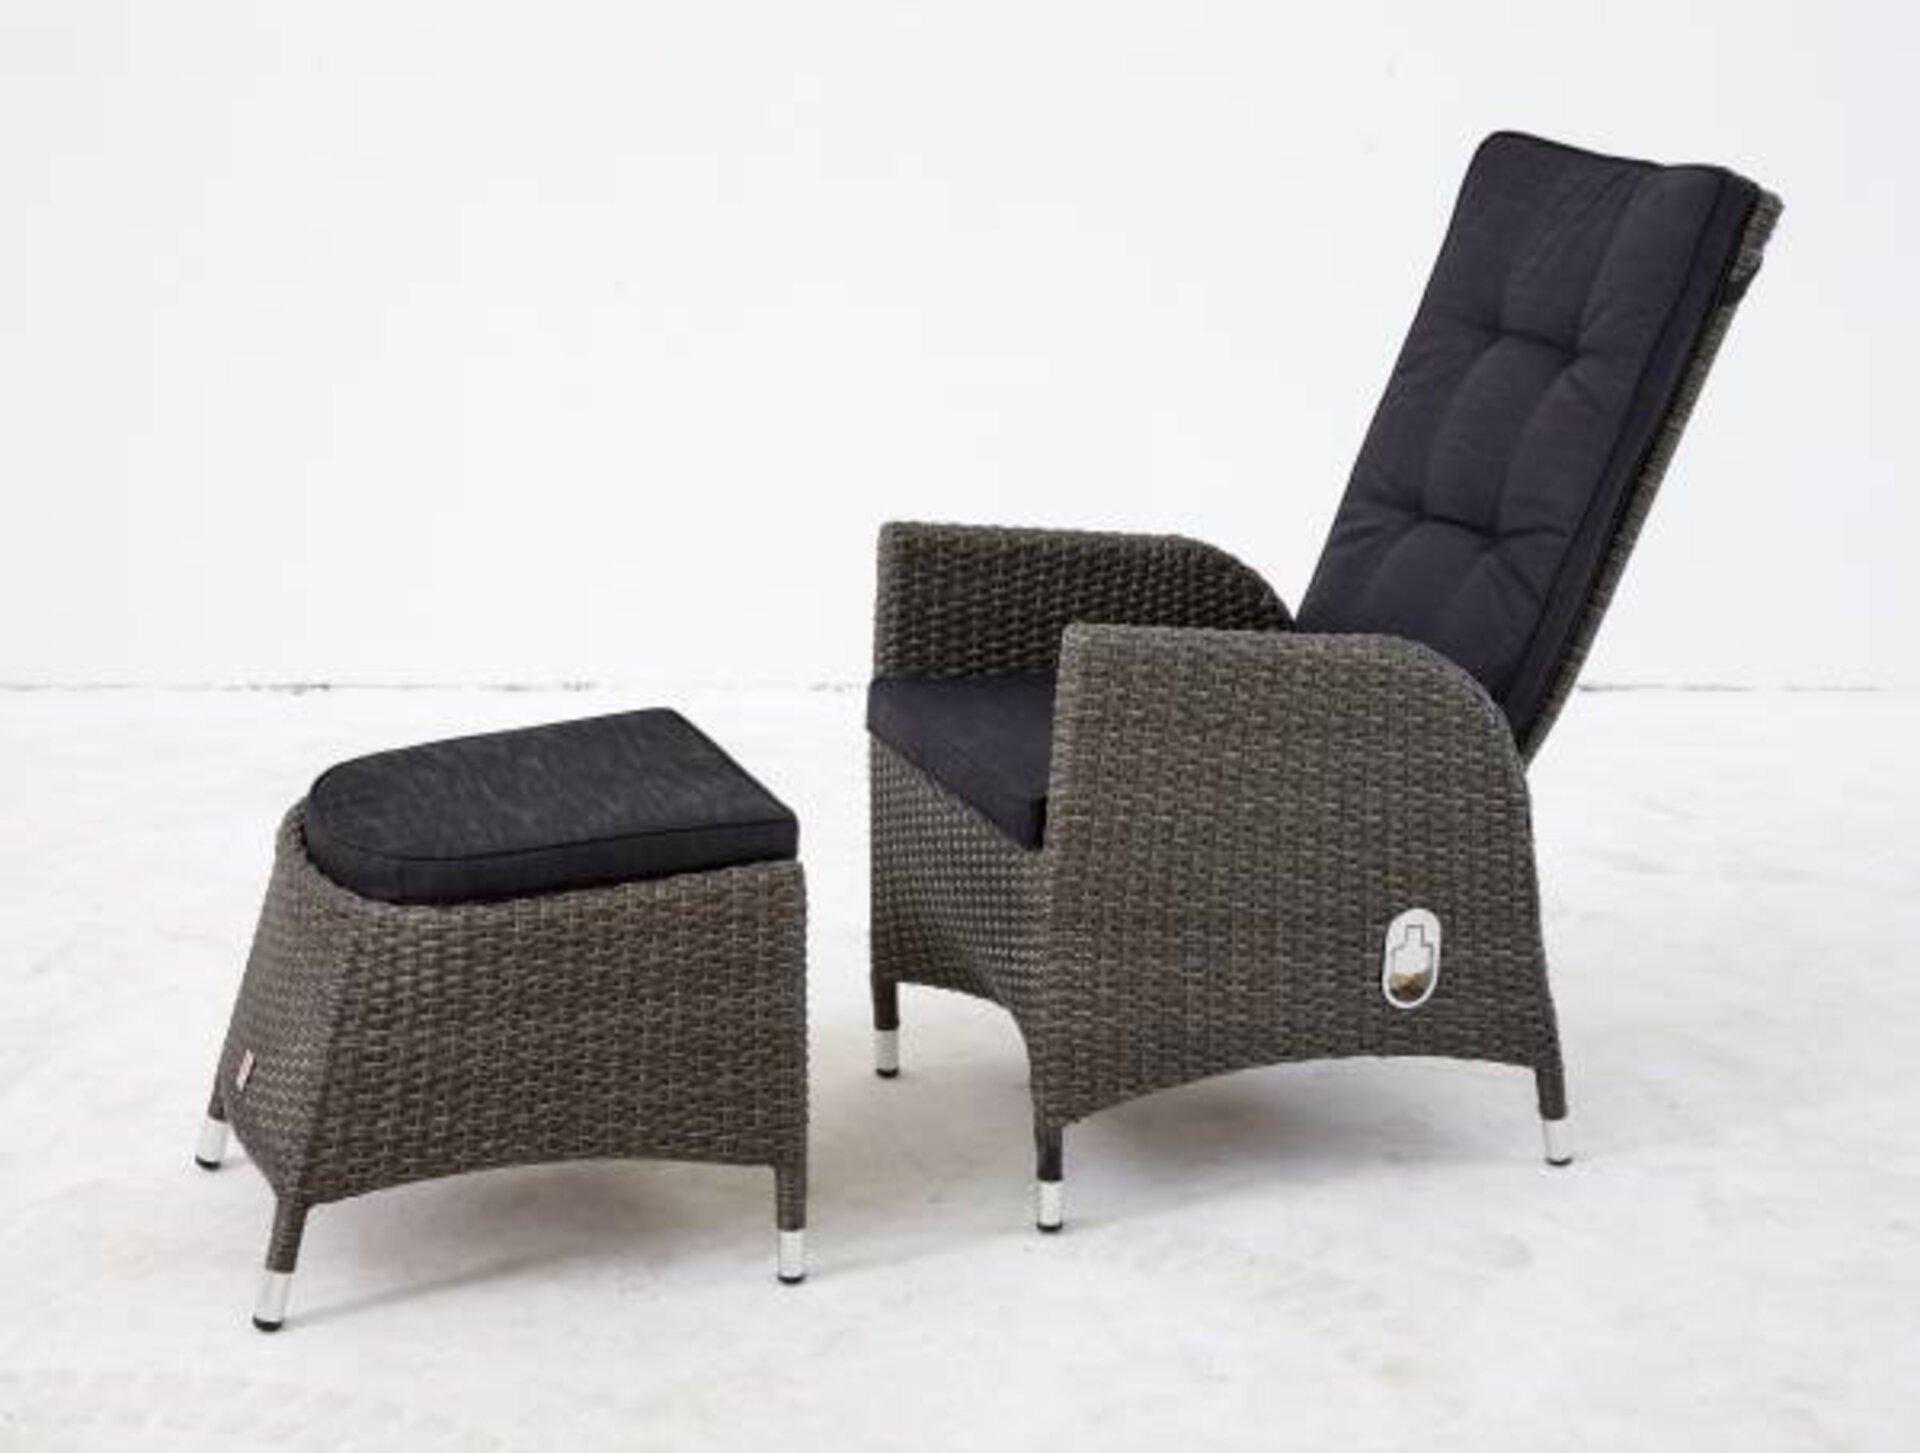 Hocker Barcelona Outdoor Textil 44 x 50 x 57 cm